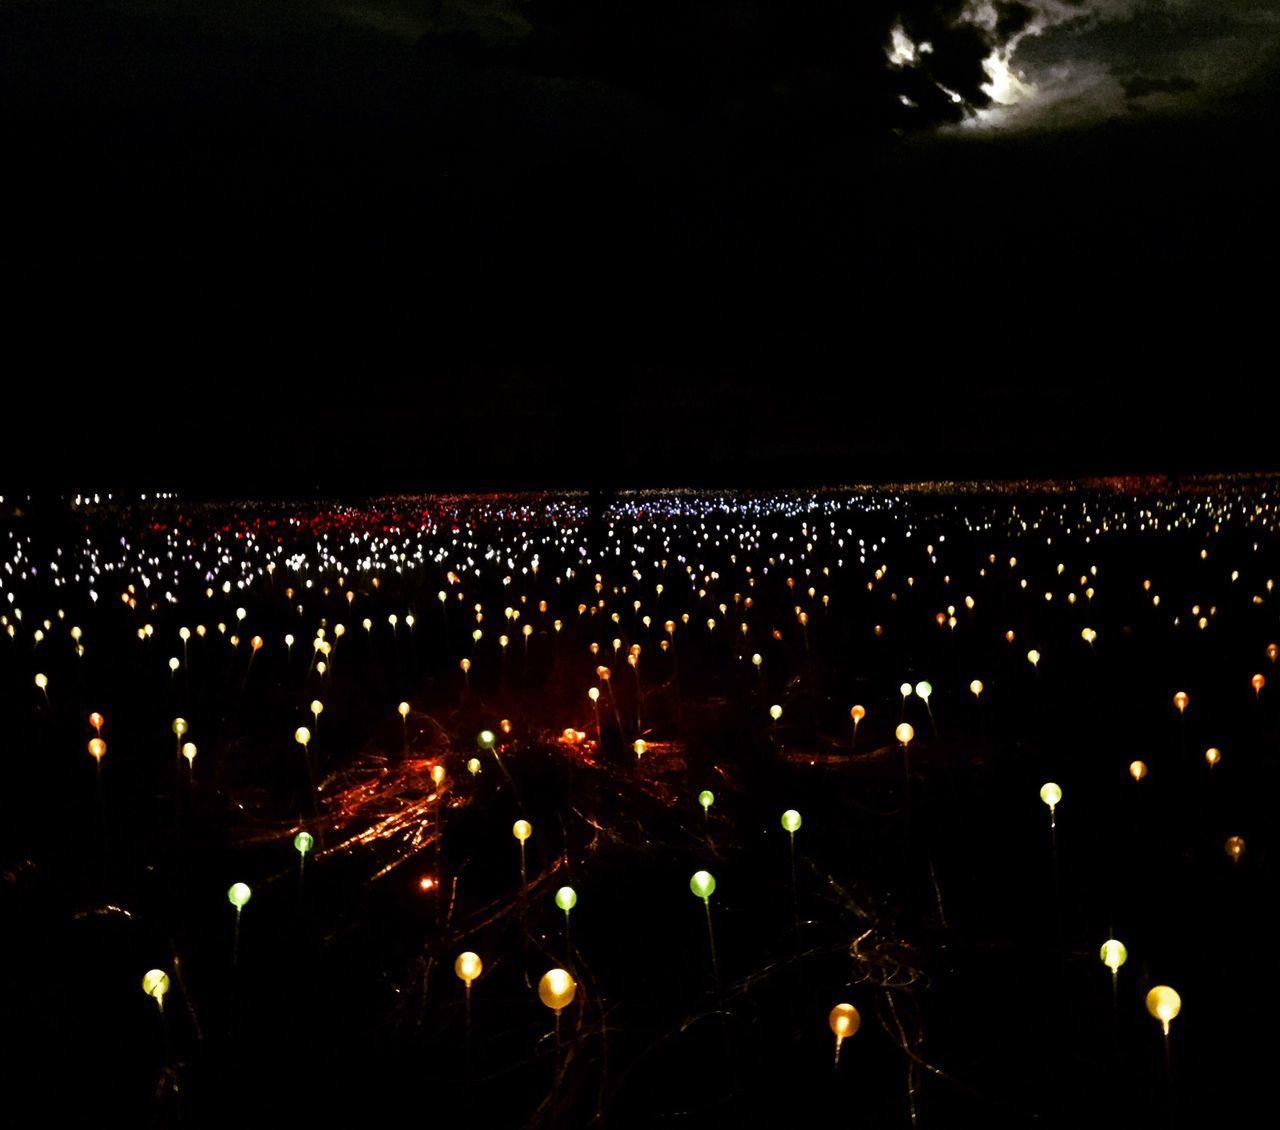 Night Lights Illuminated Exhibition Australia First Eyeem Photo Fieldoflights Ulurukatatjutanationalpark Tranquility